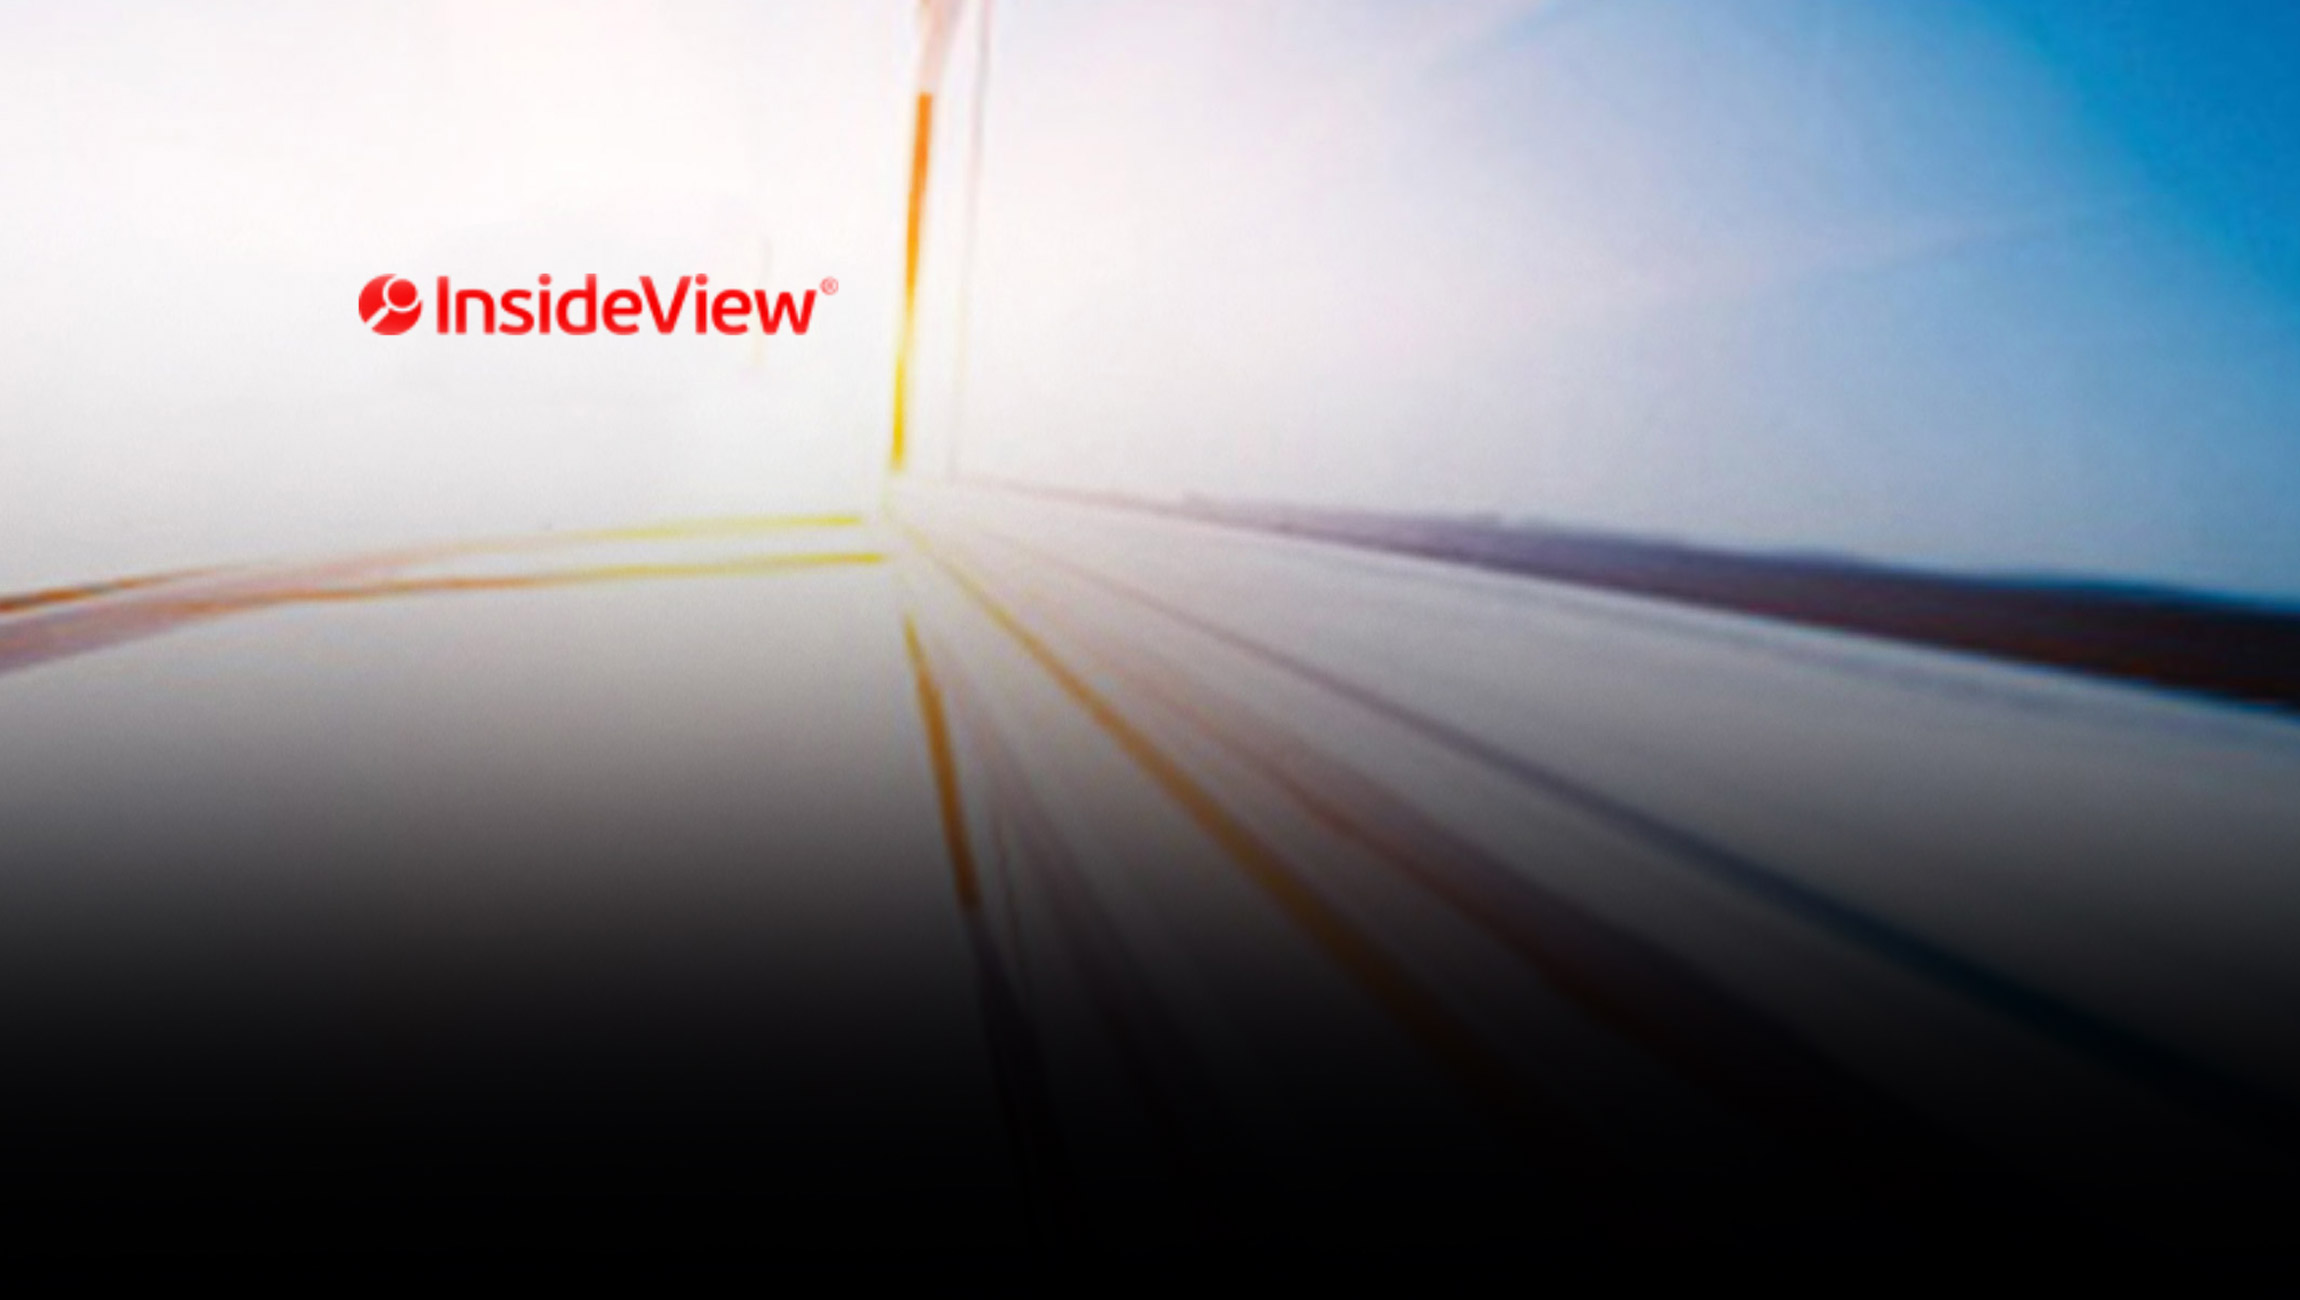 InsideView Named a G2 Best Software of 2021 Winner